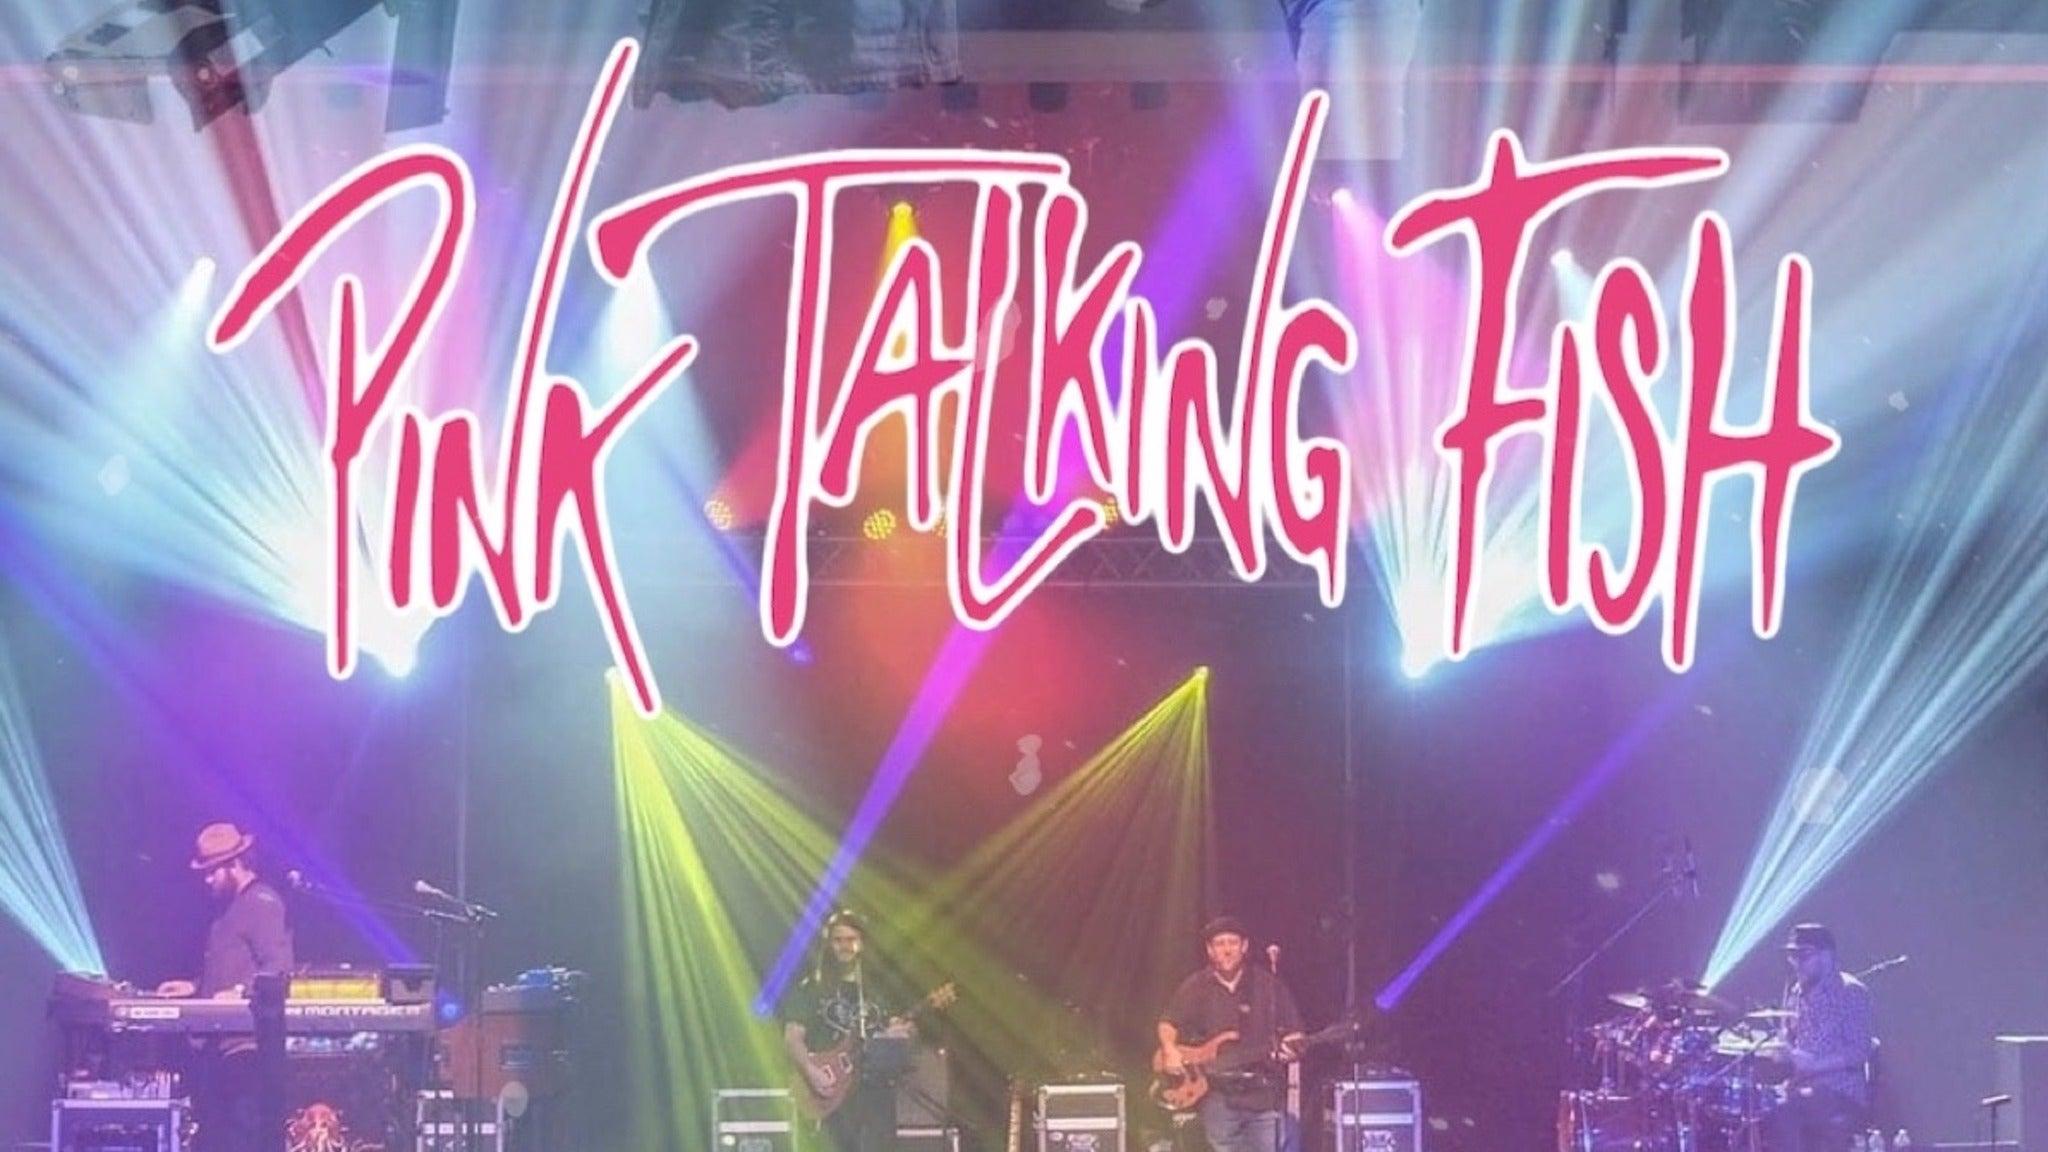 Pink Talking Fish pre-sale password for early tickets in Oak Bluffs